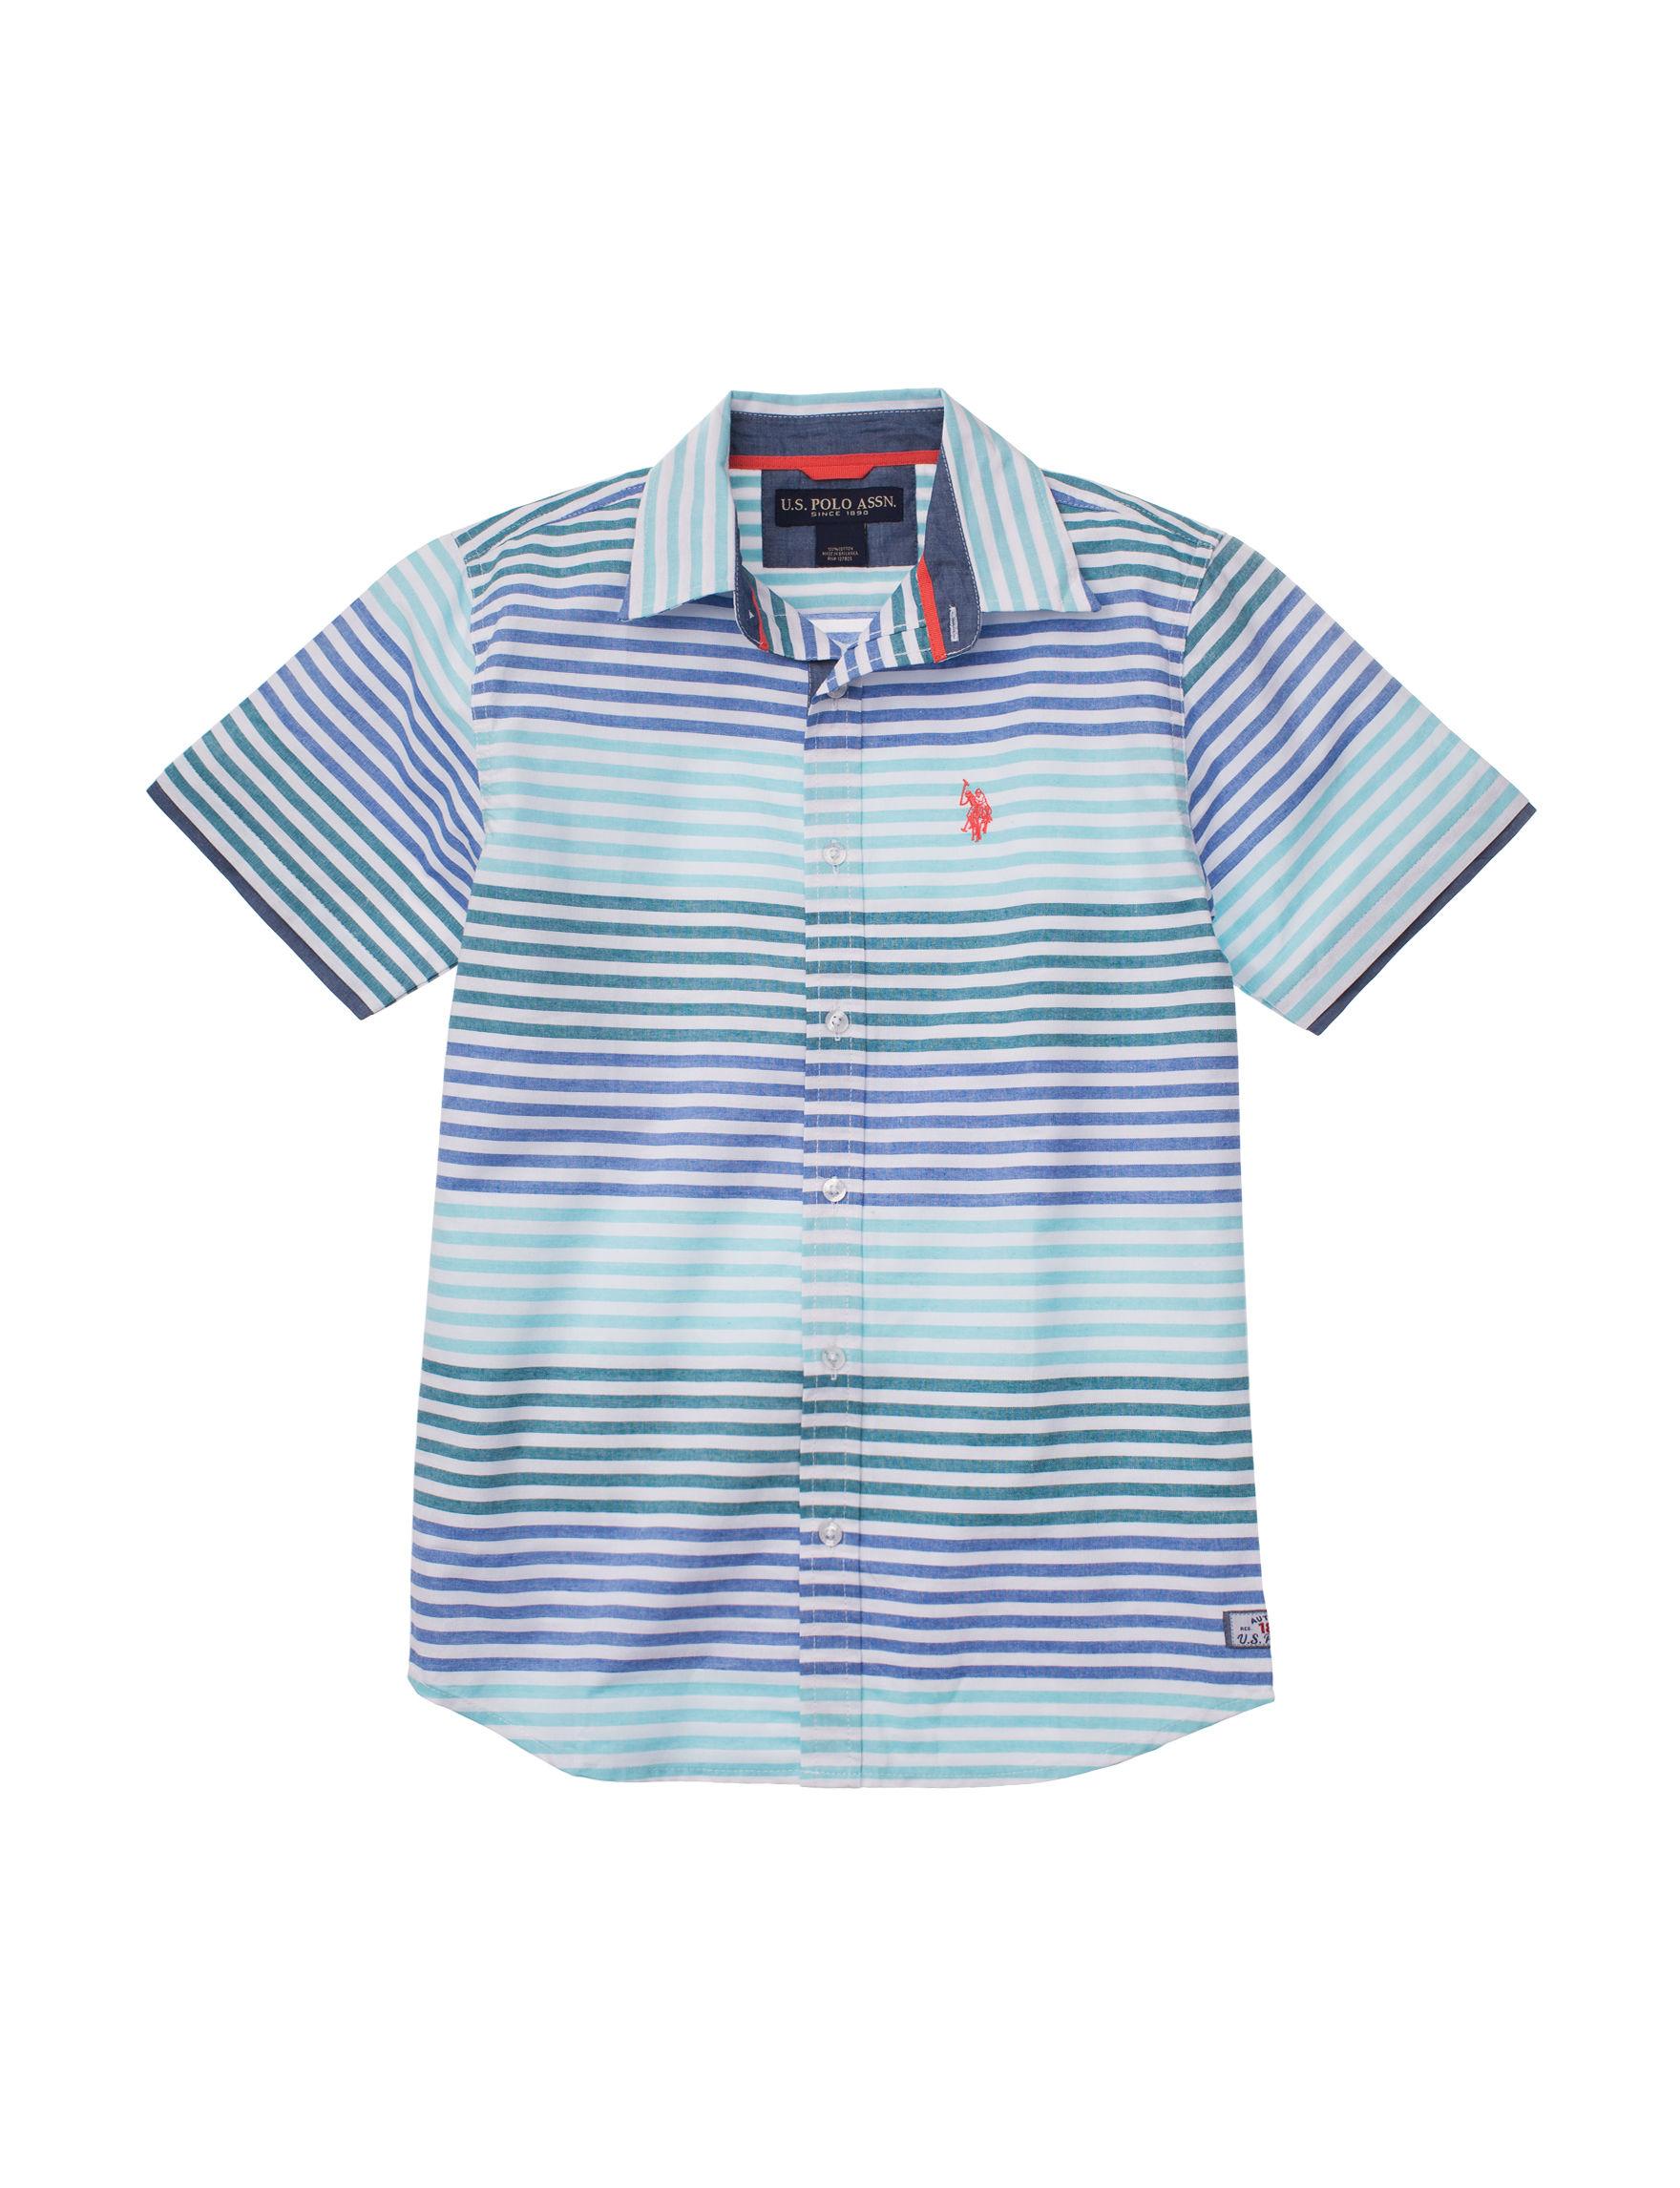 U.S. Polo Assn. Blue Stripe